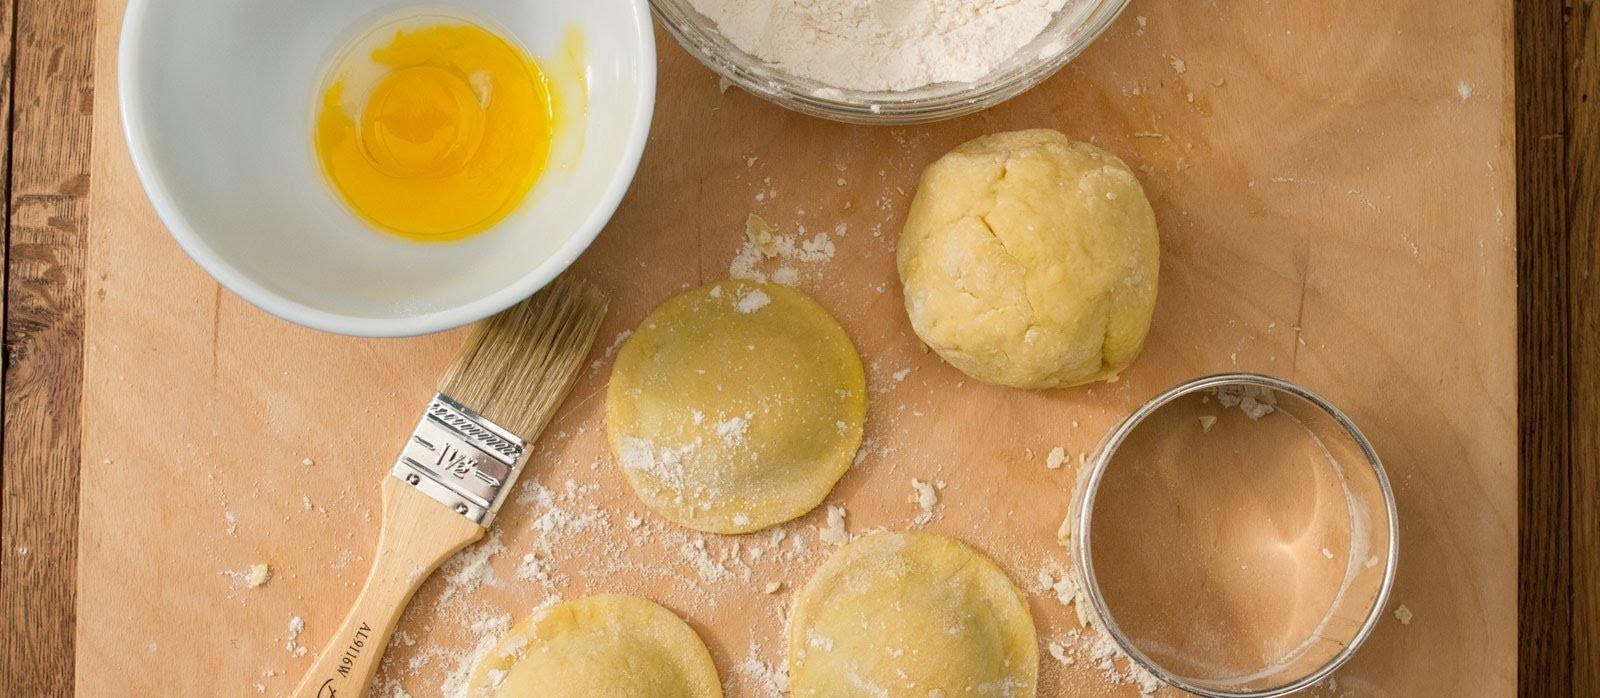 Michael Chiarello's Gnocchi Ravioli Recipe - Cook Taste Eat